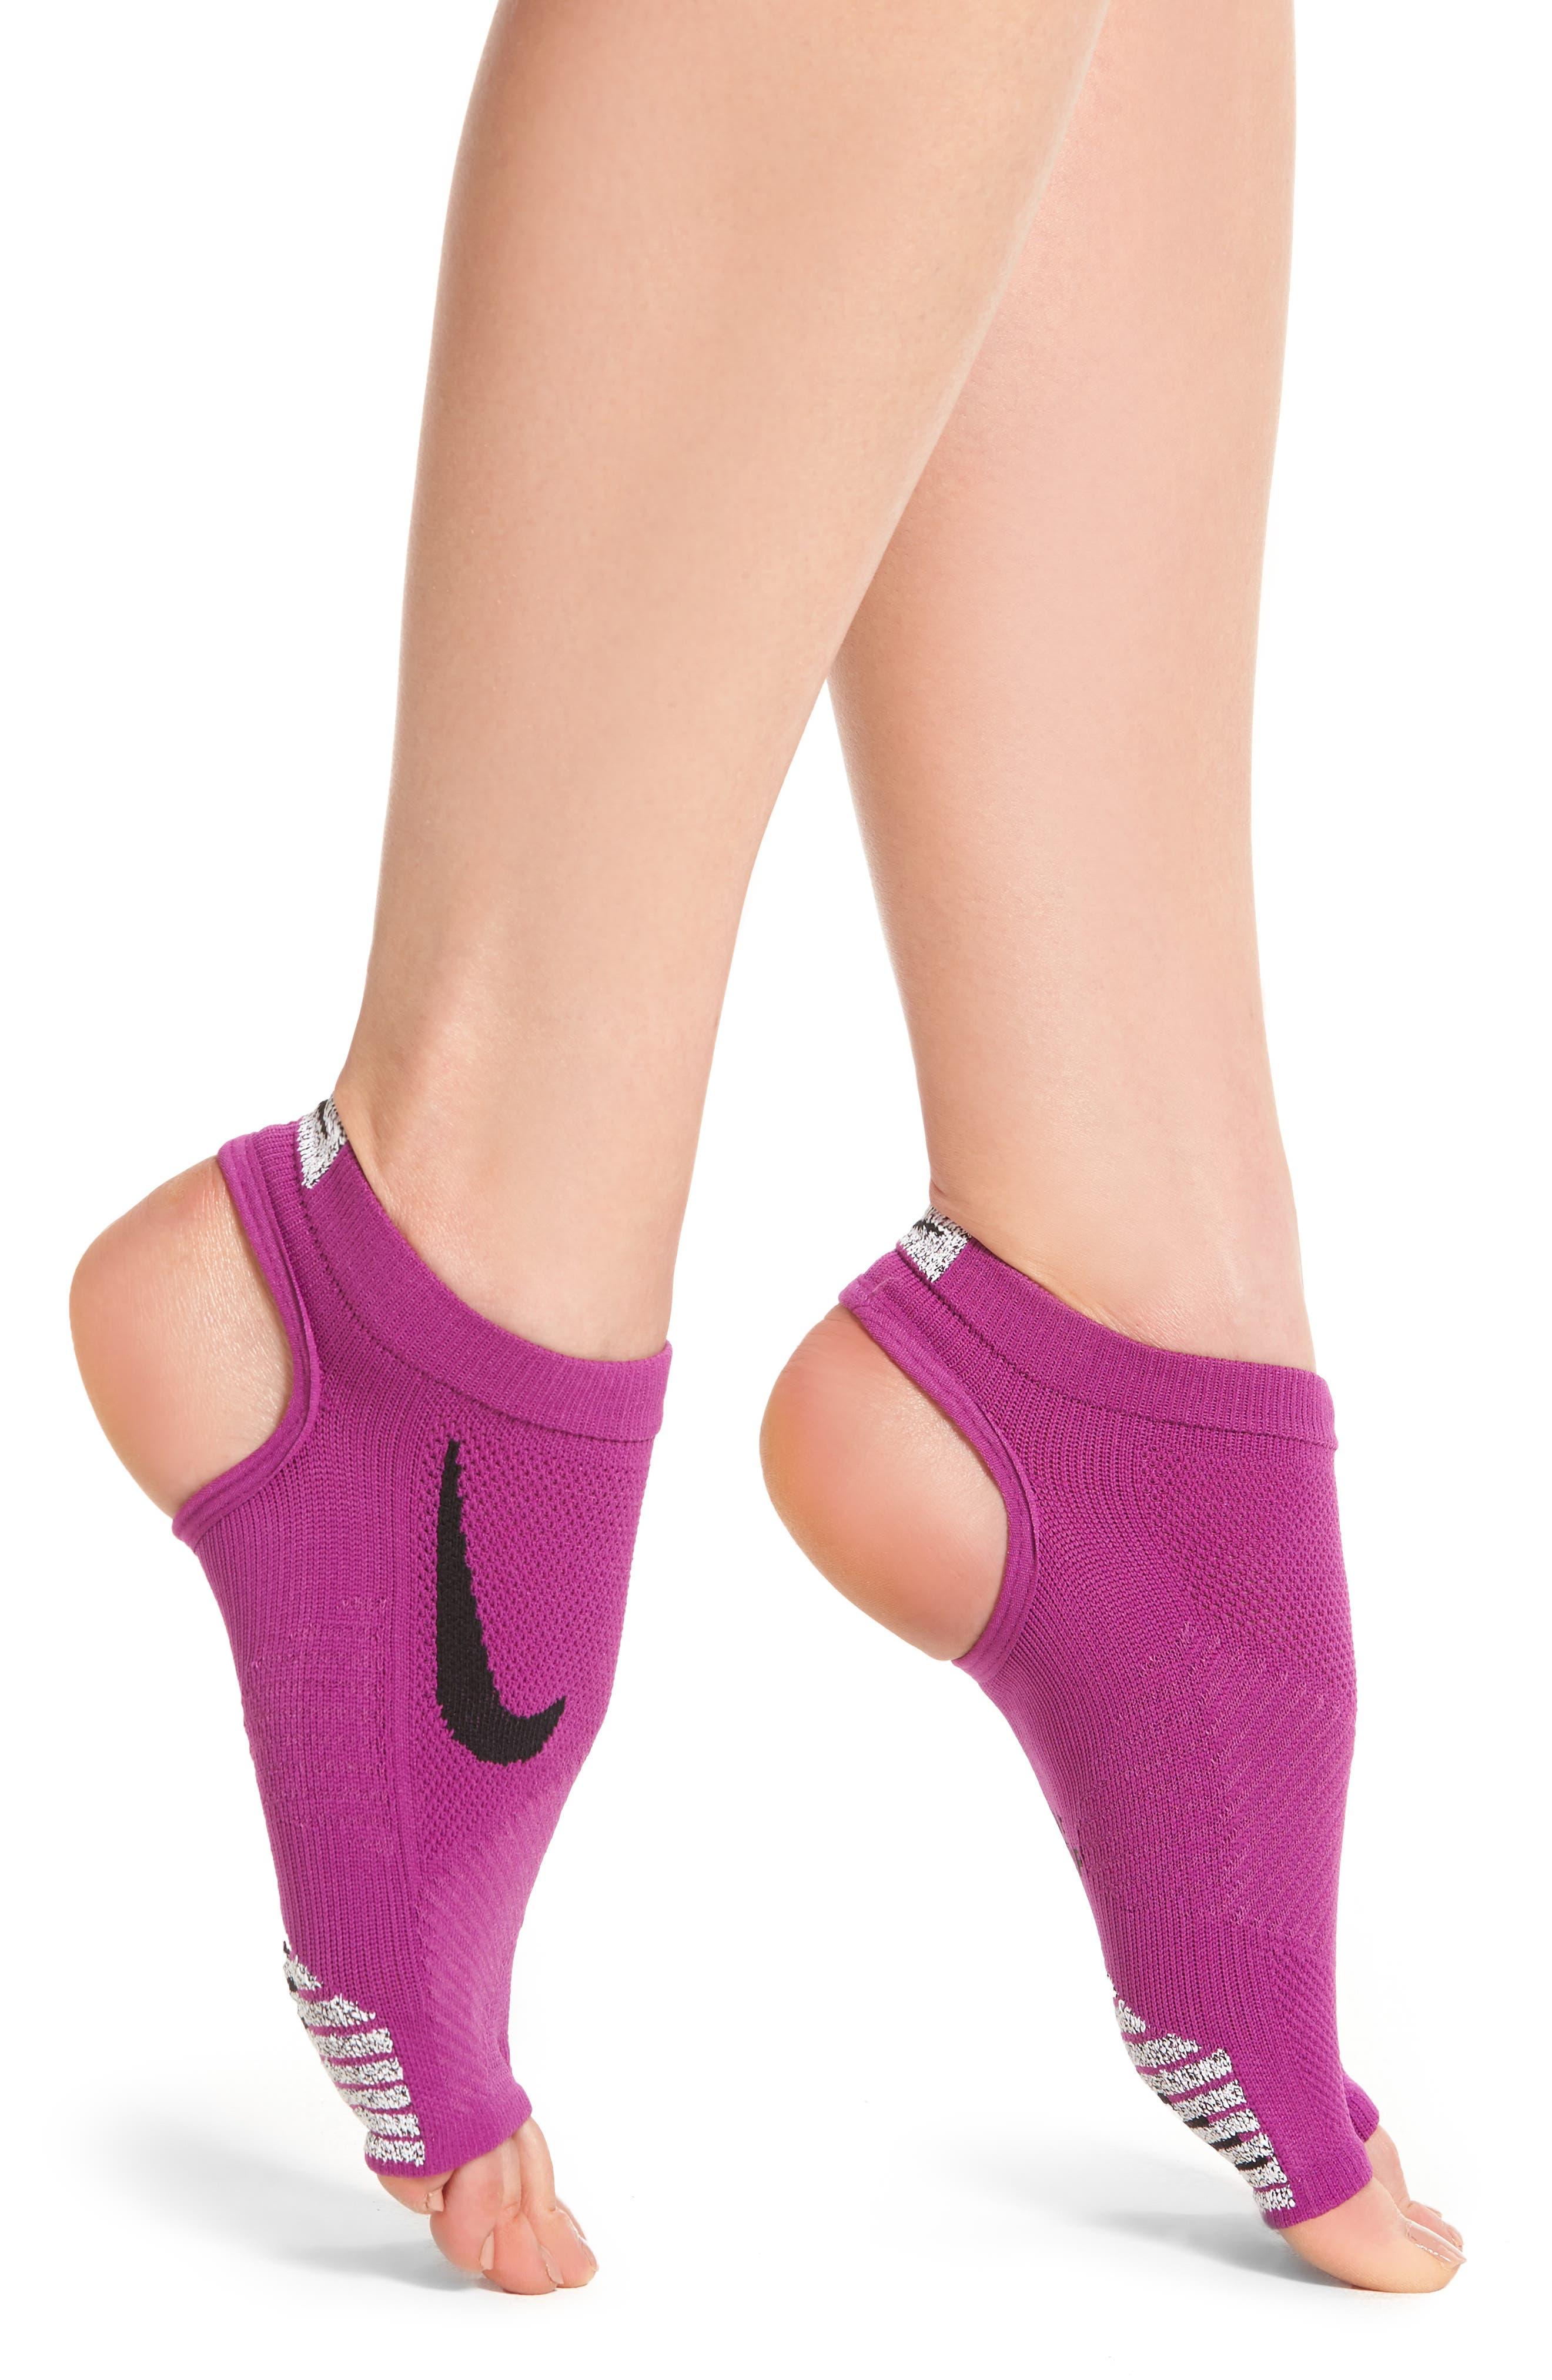 Nike Elite Studio Stability Training Grip Socks